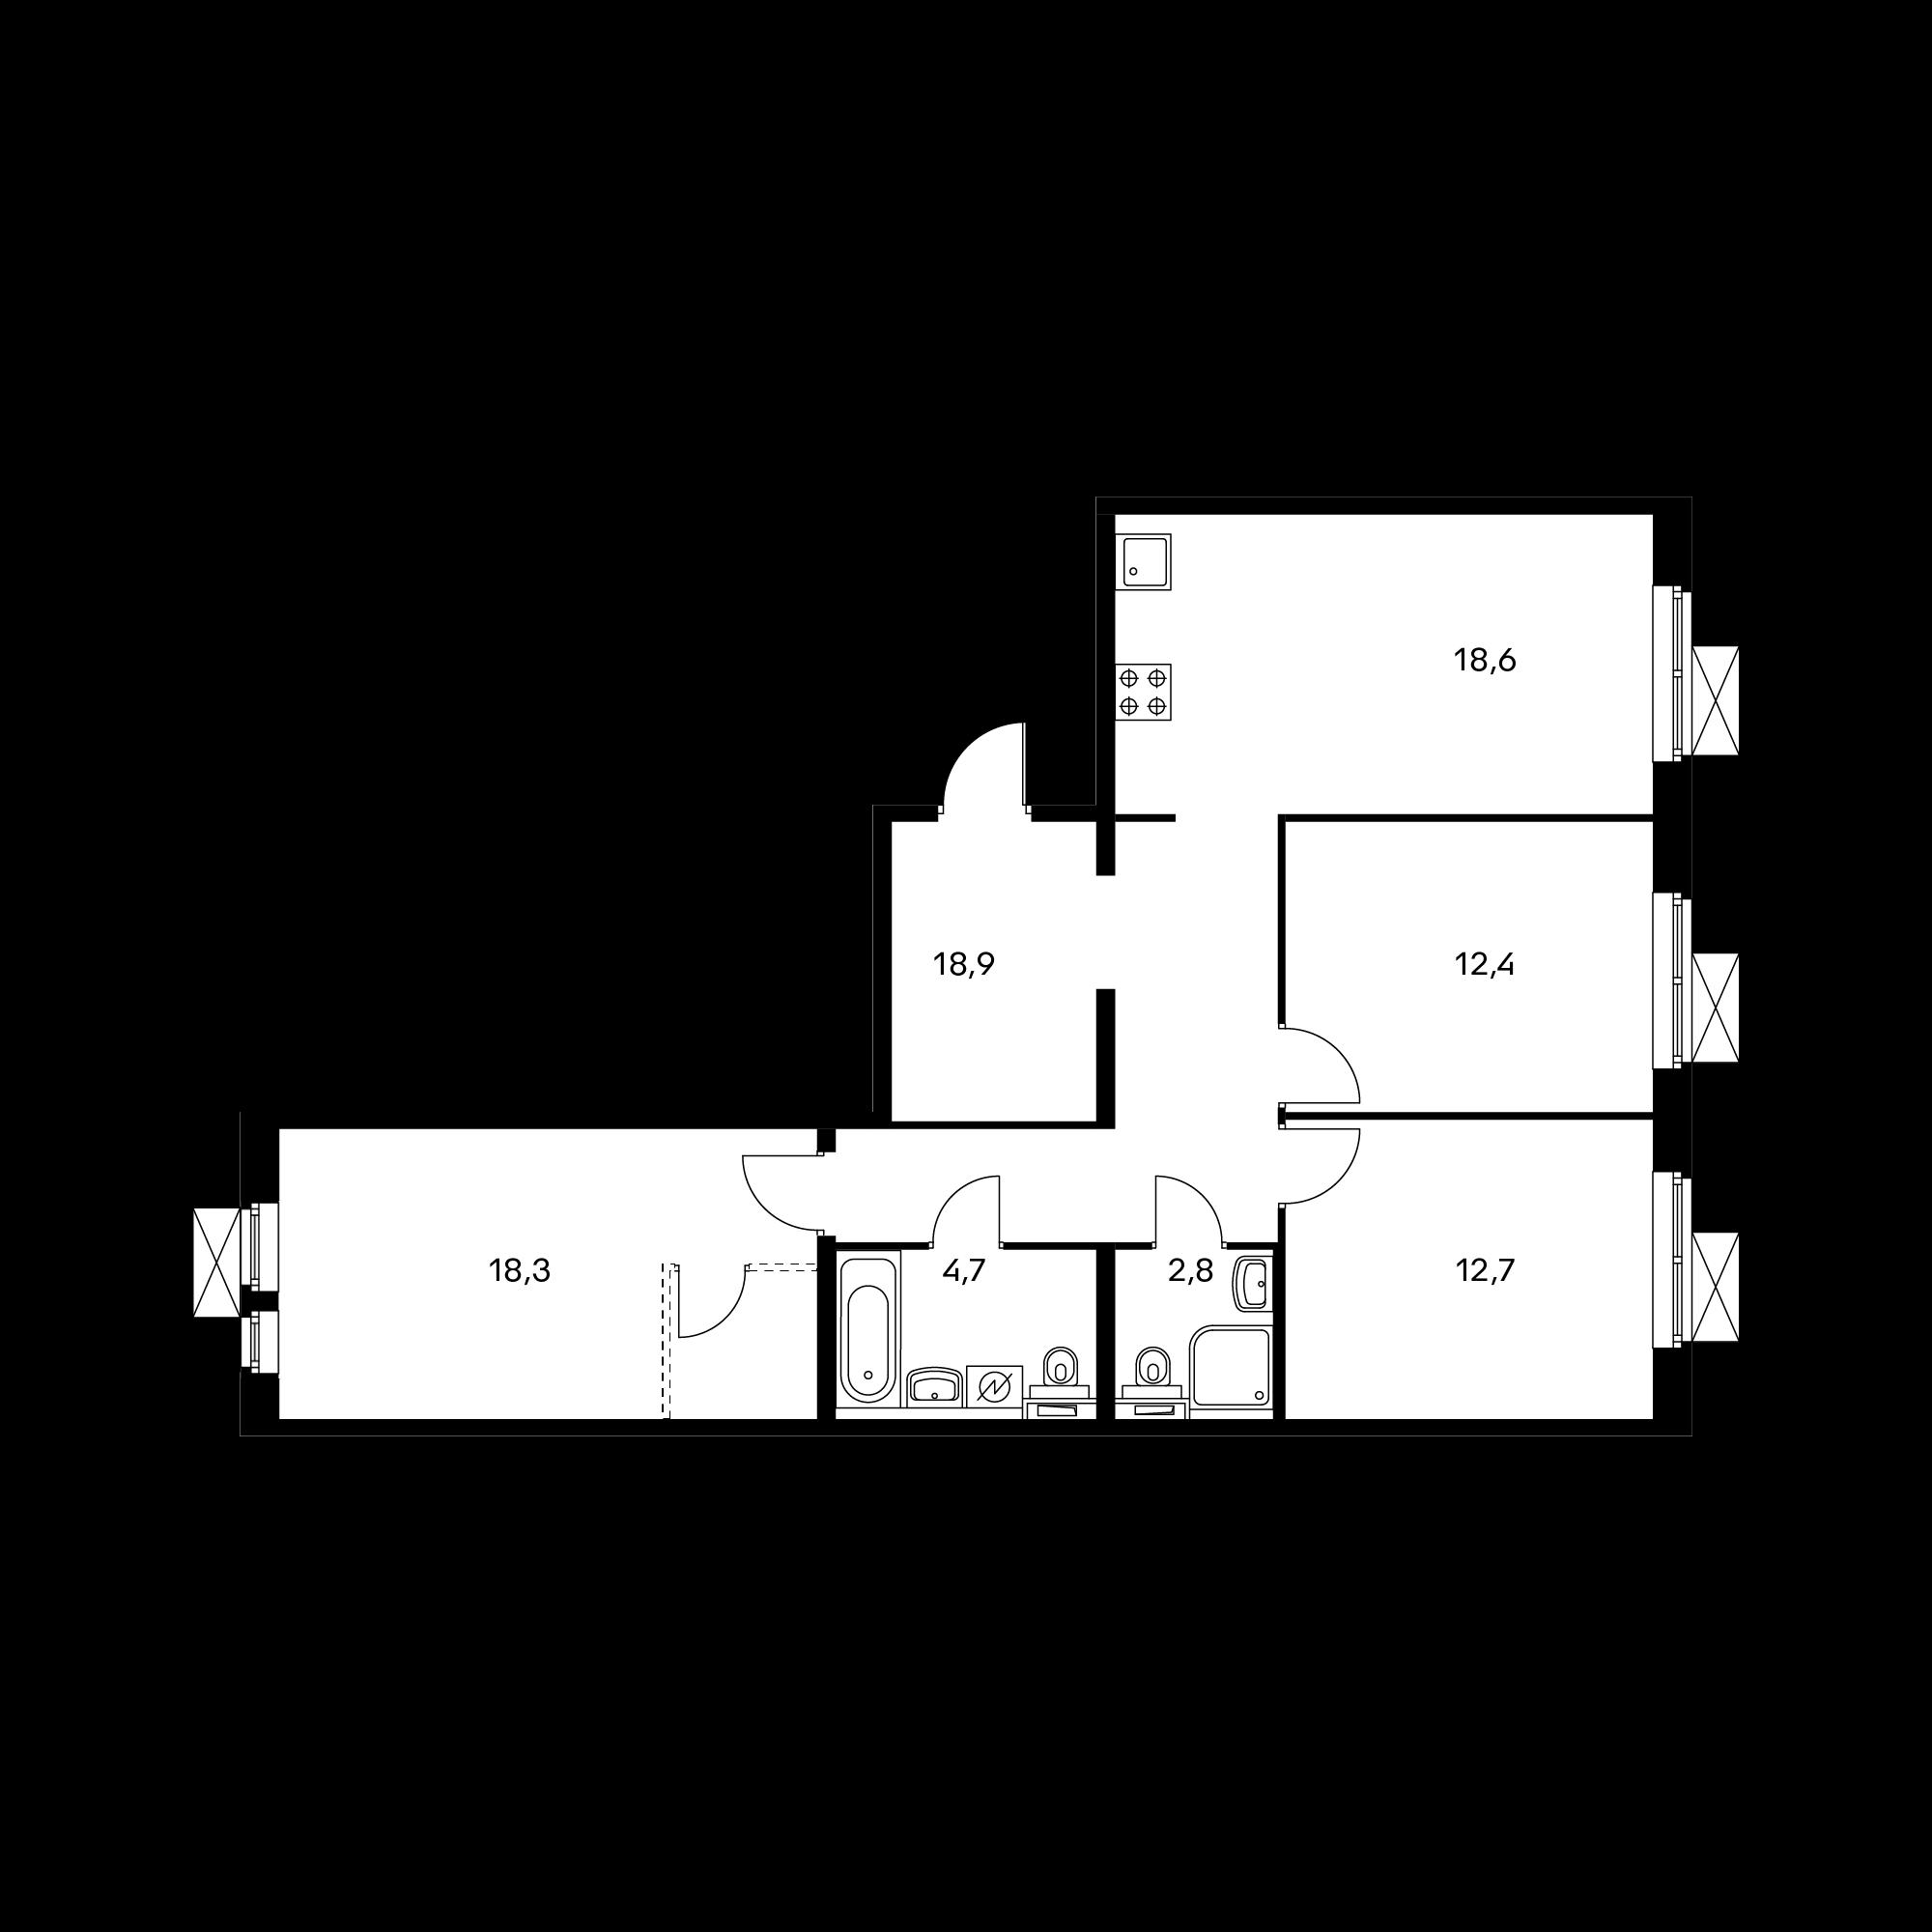 3EL3_9.9-4*